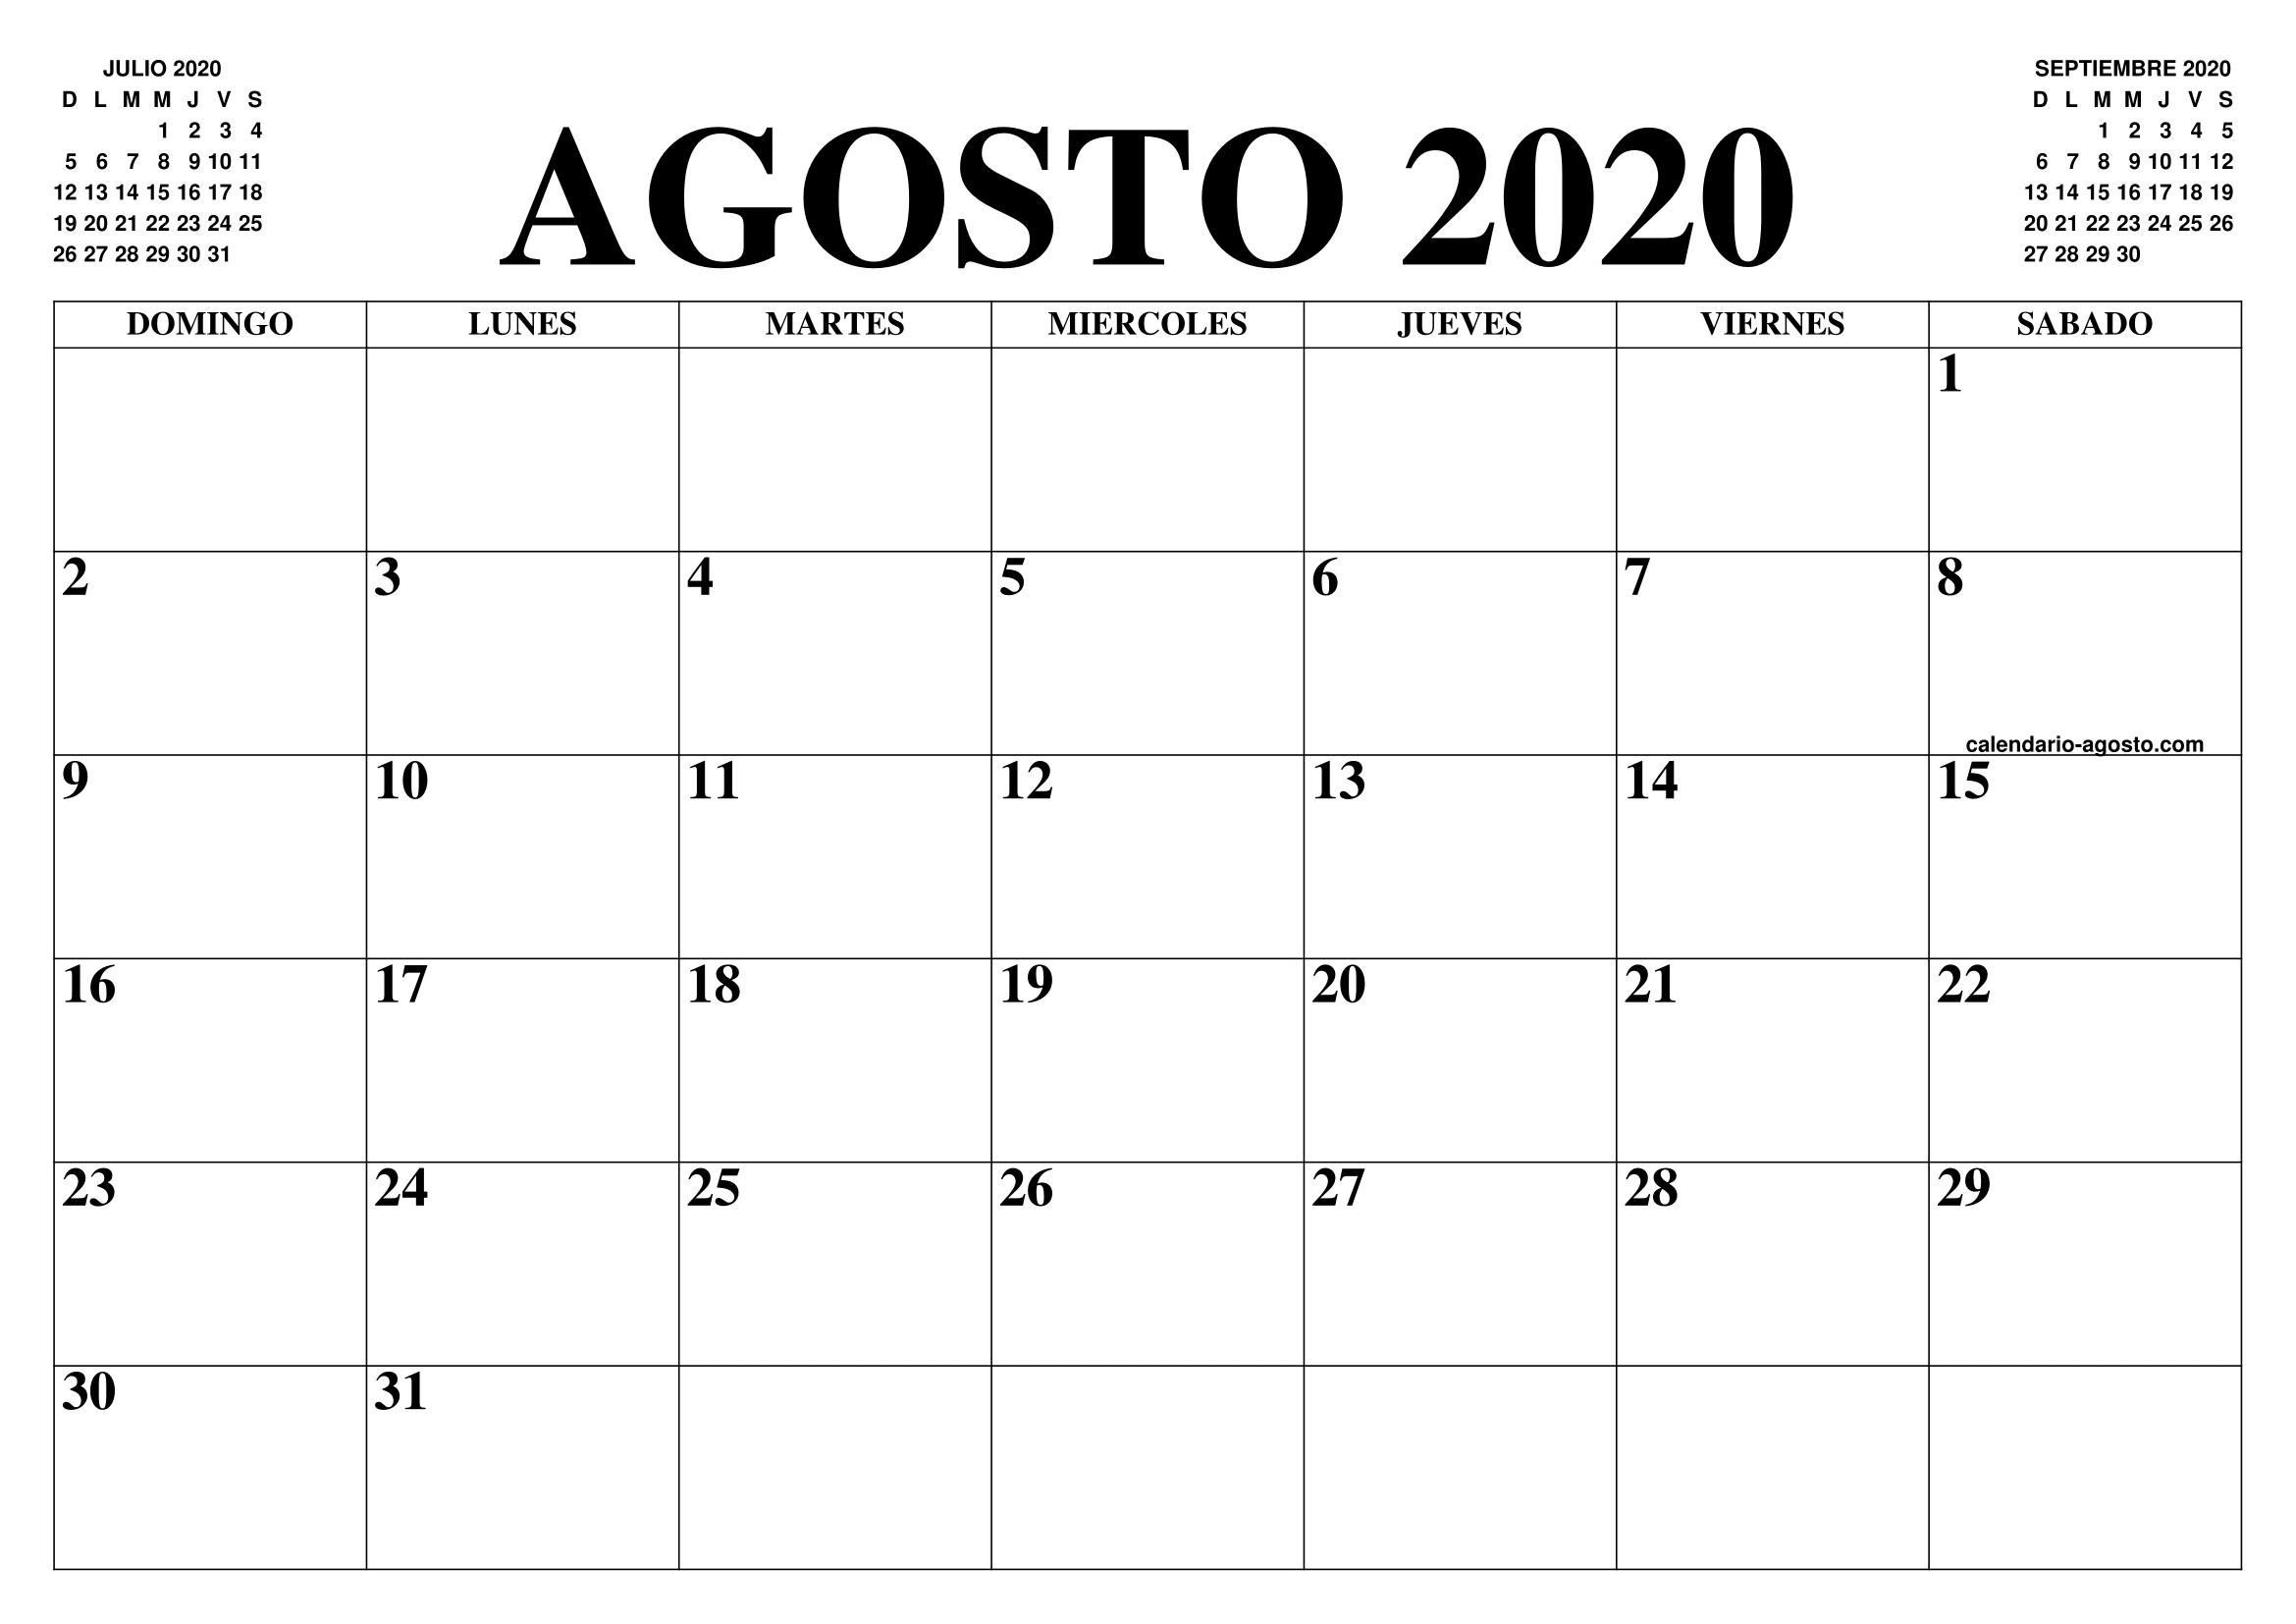 Calendario Junio Julio 2020.Calendario Agosto 2020 El Calendario Agosto Para Imprimir Gratis